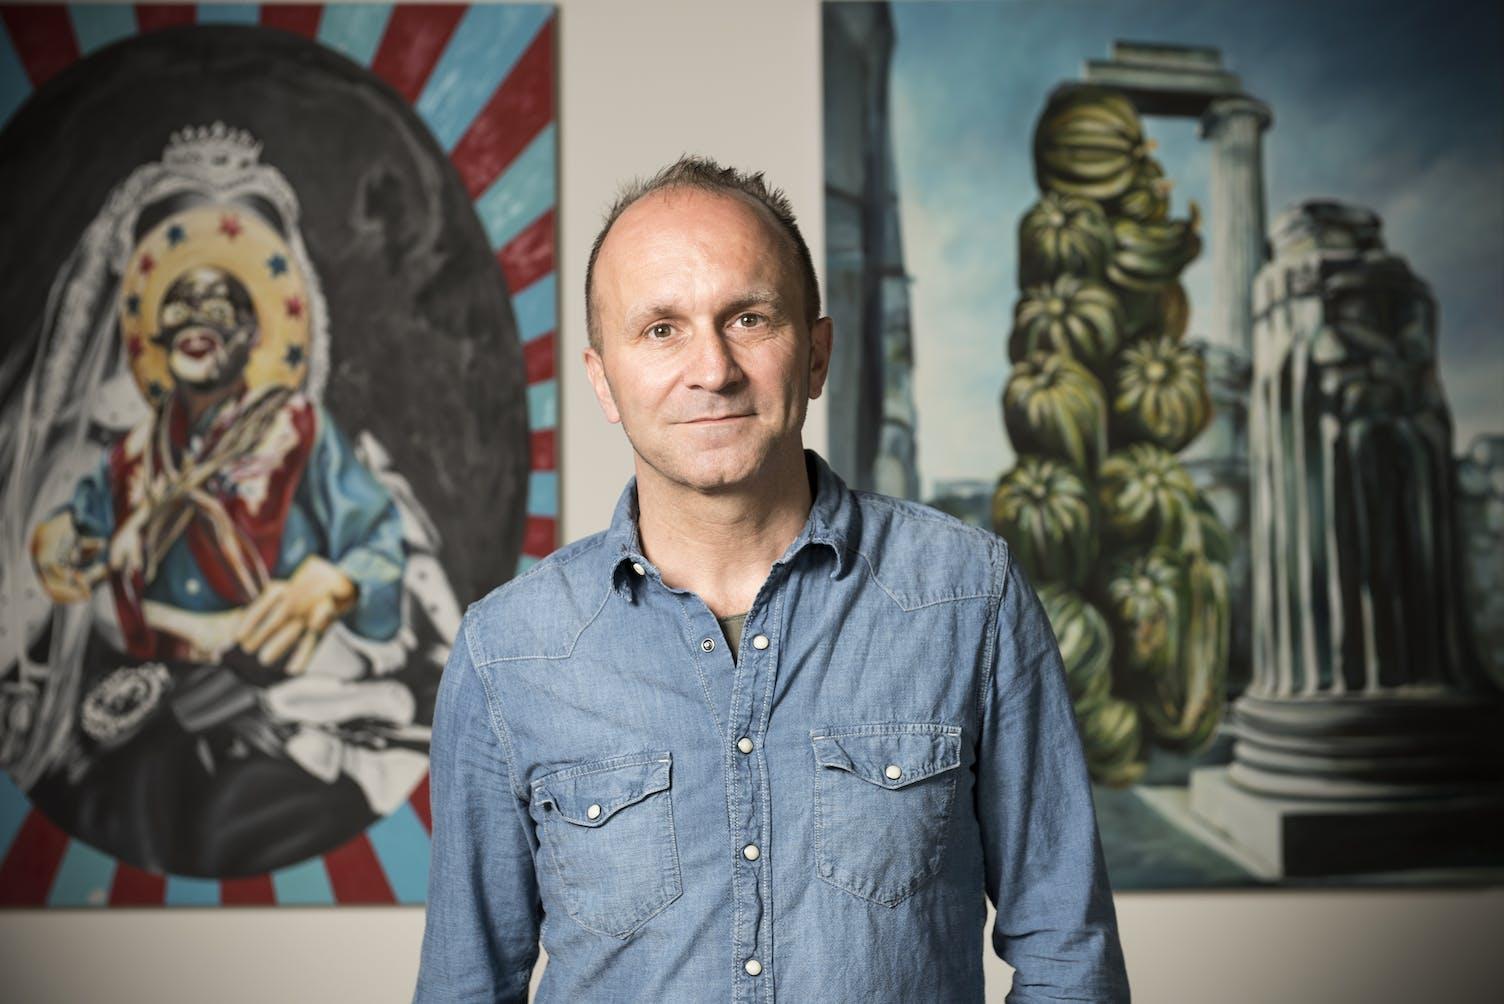 Christof Huber